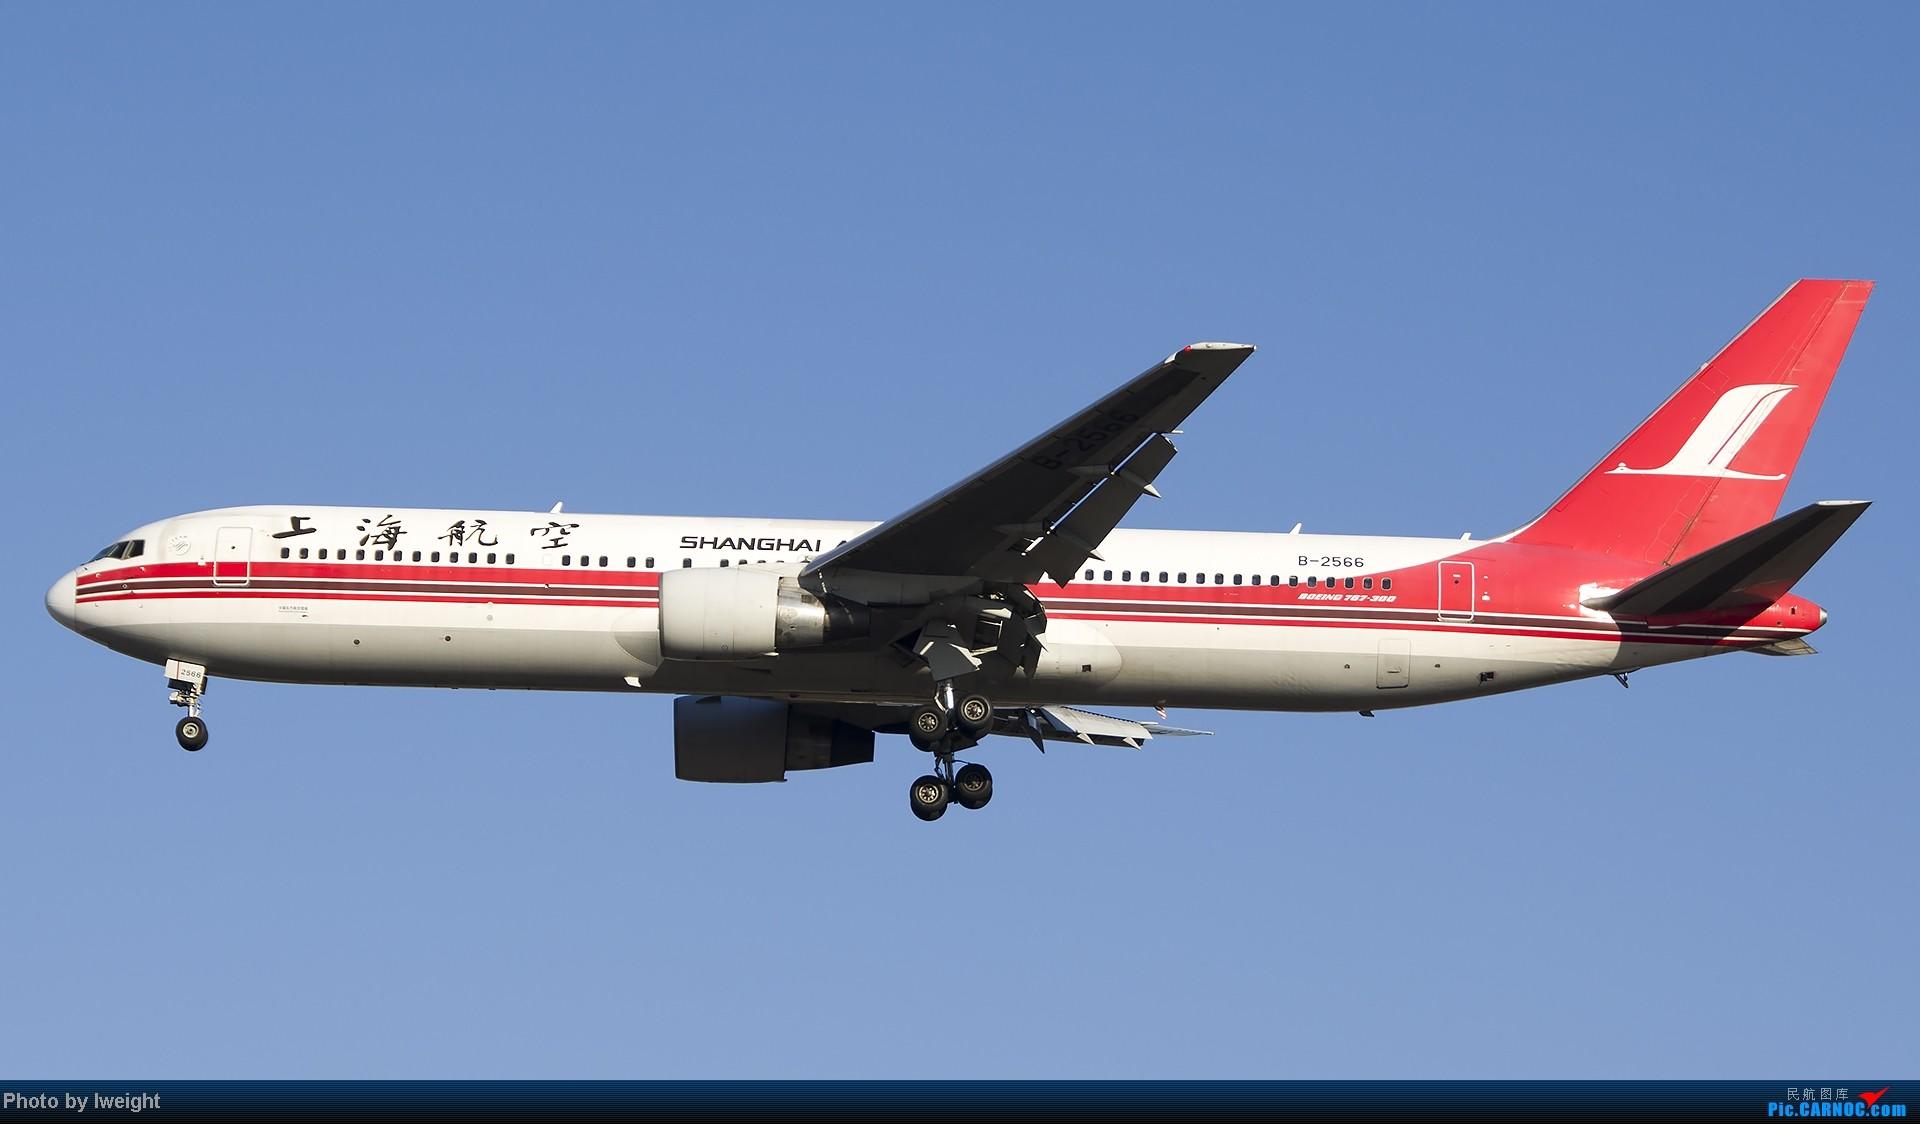 Re:[原创]抓住APEC蓝的尾巴,再拍上一组 BOEING 767-300 B-2566 中国北京首都机场